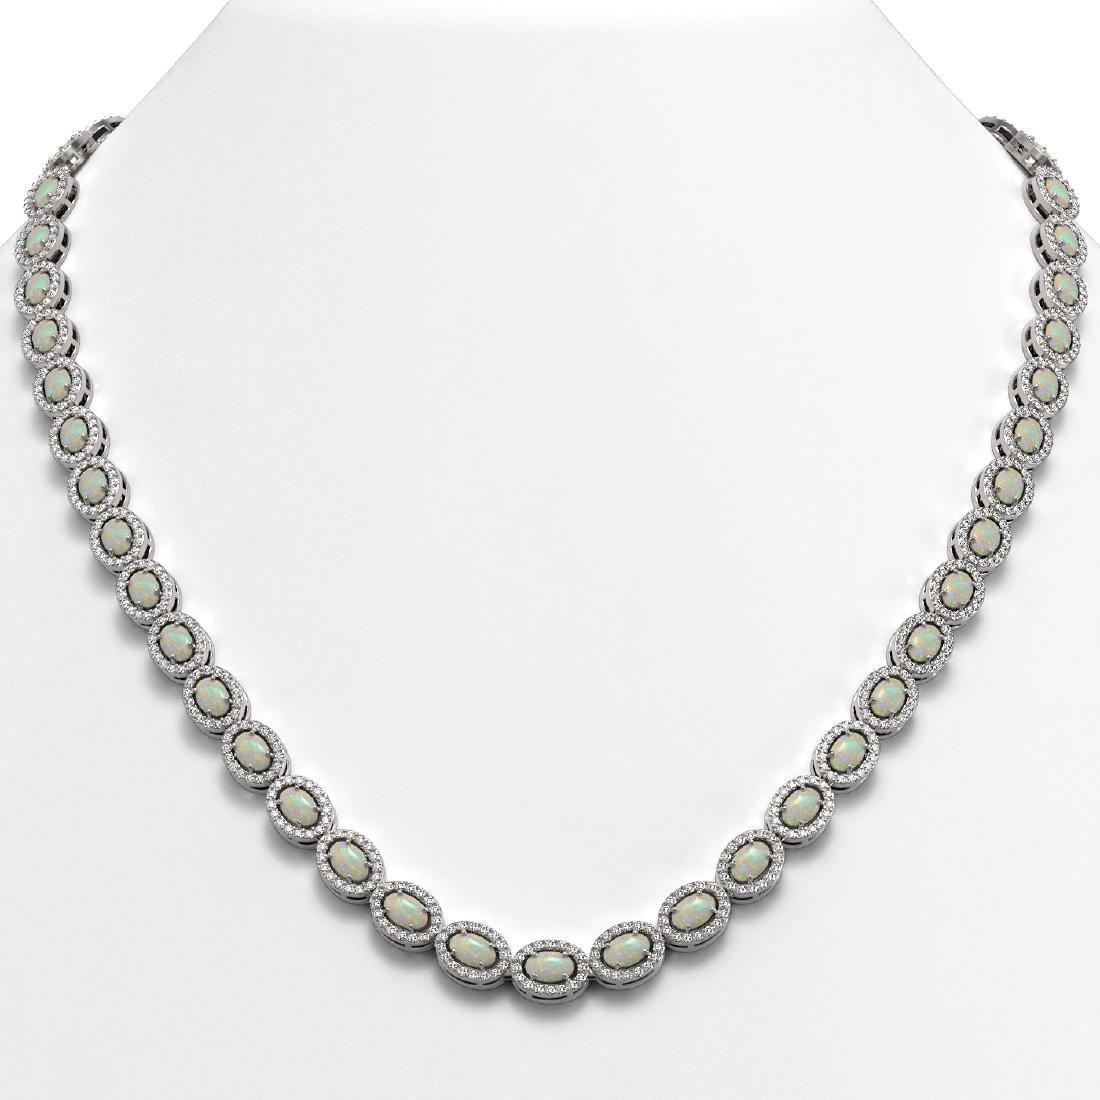 20.22 CTW Opal & Diamond Halo Necklace 10K White Gold